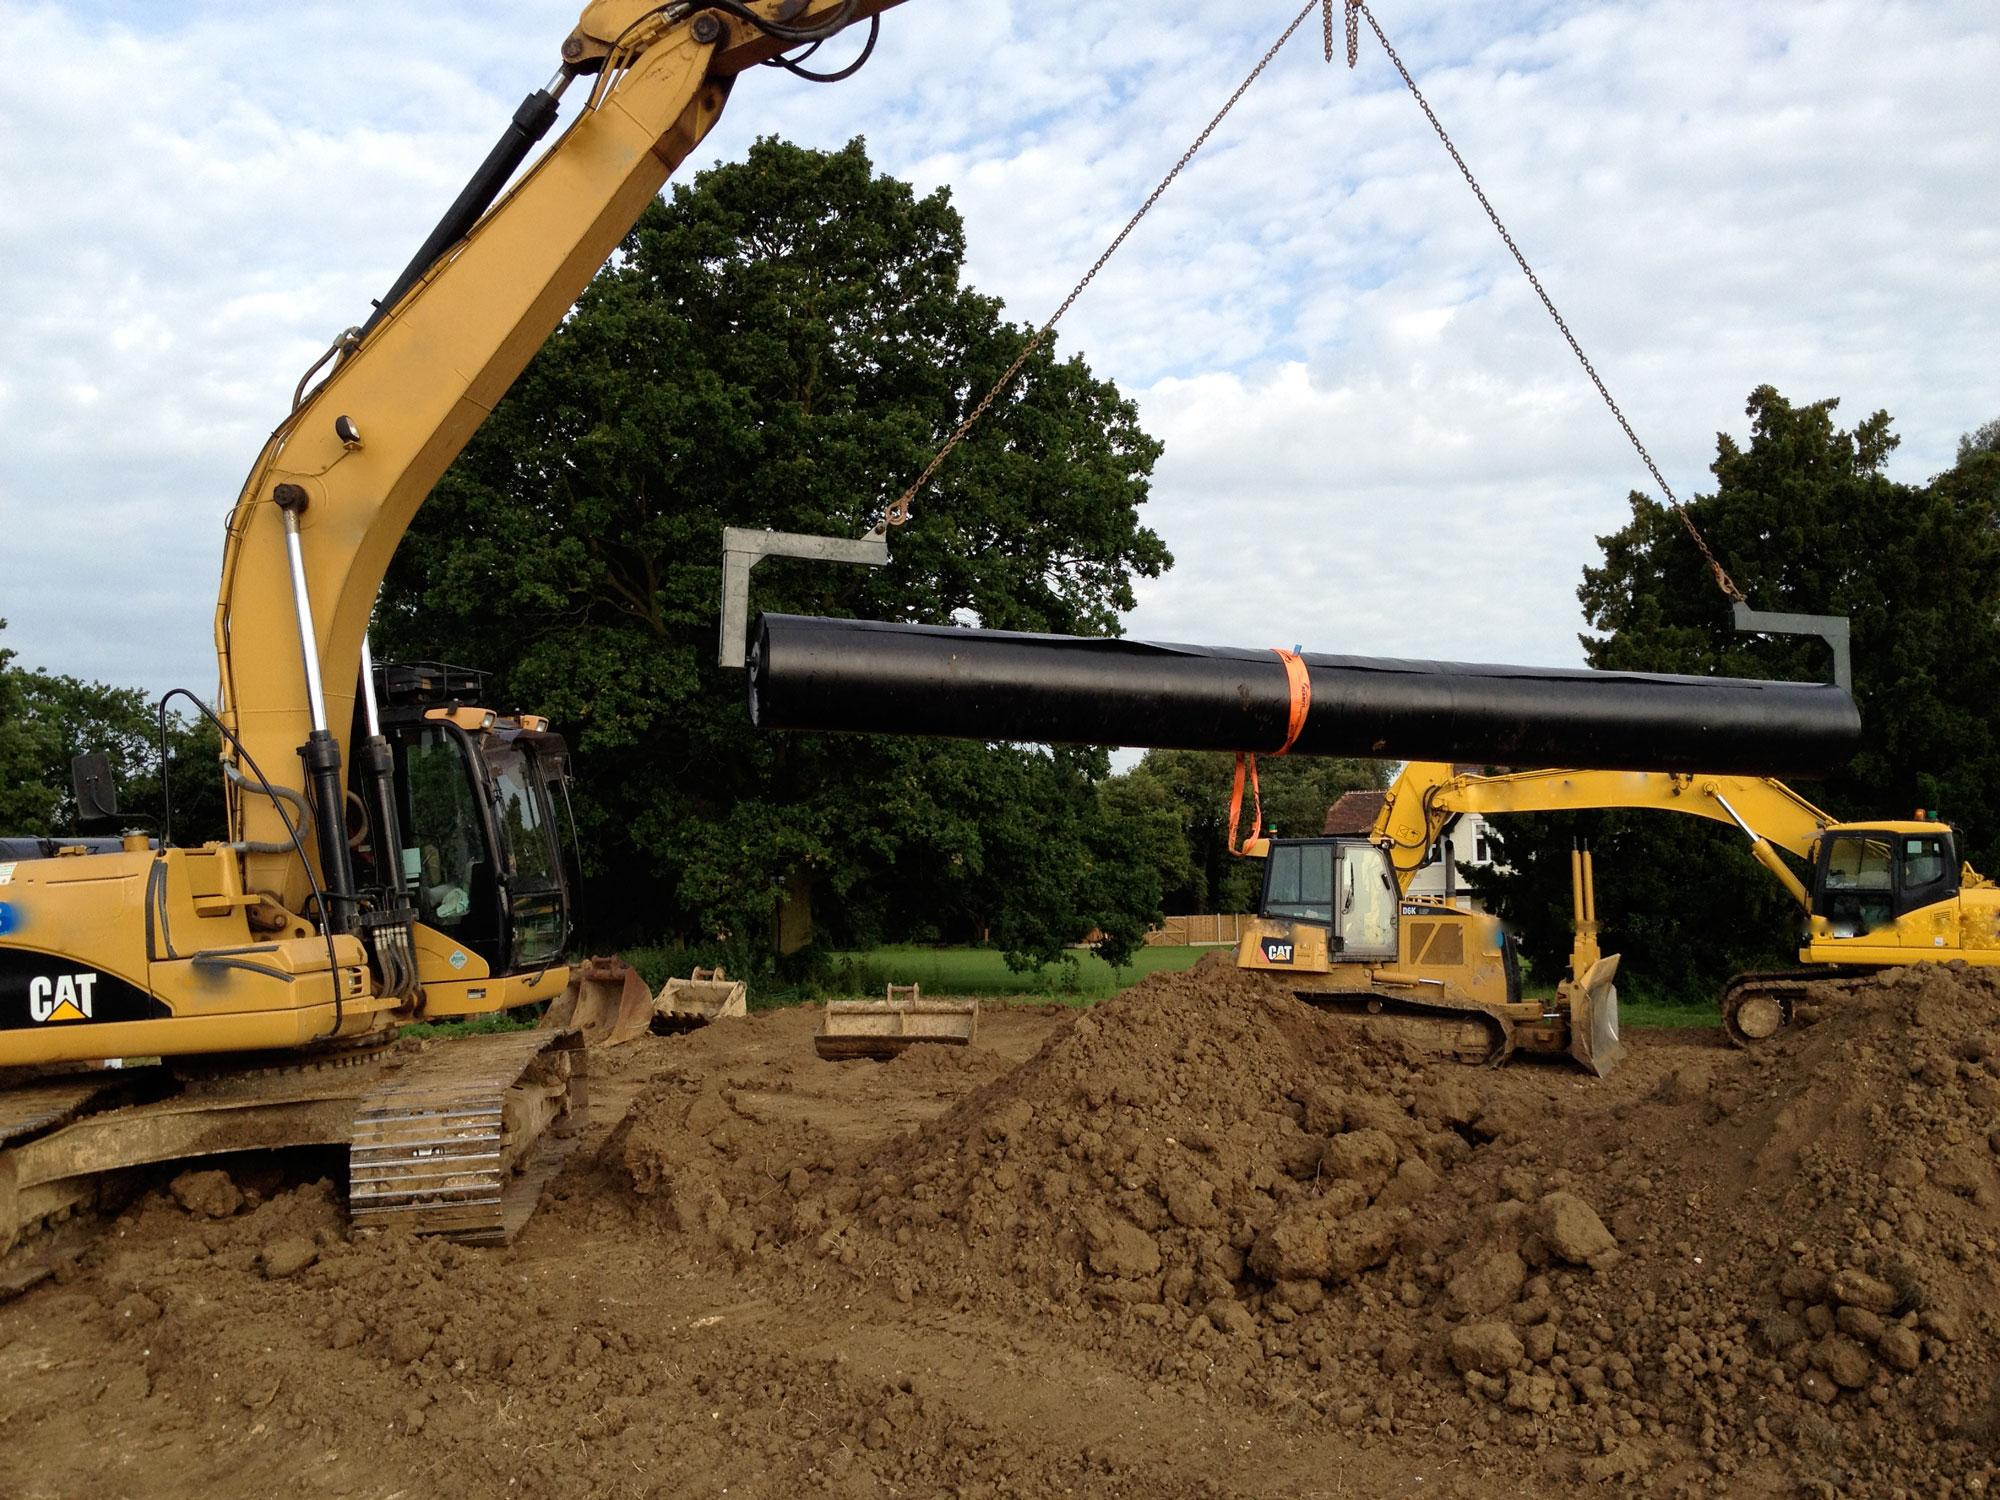 Excavator handling a roll of liner